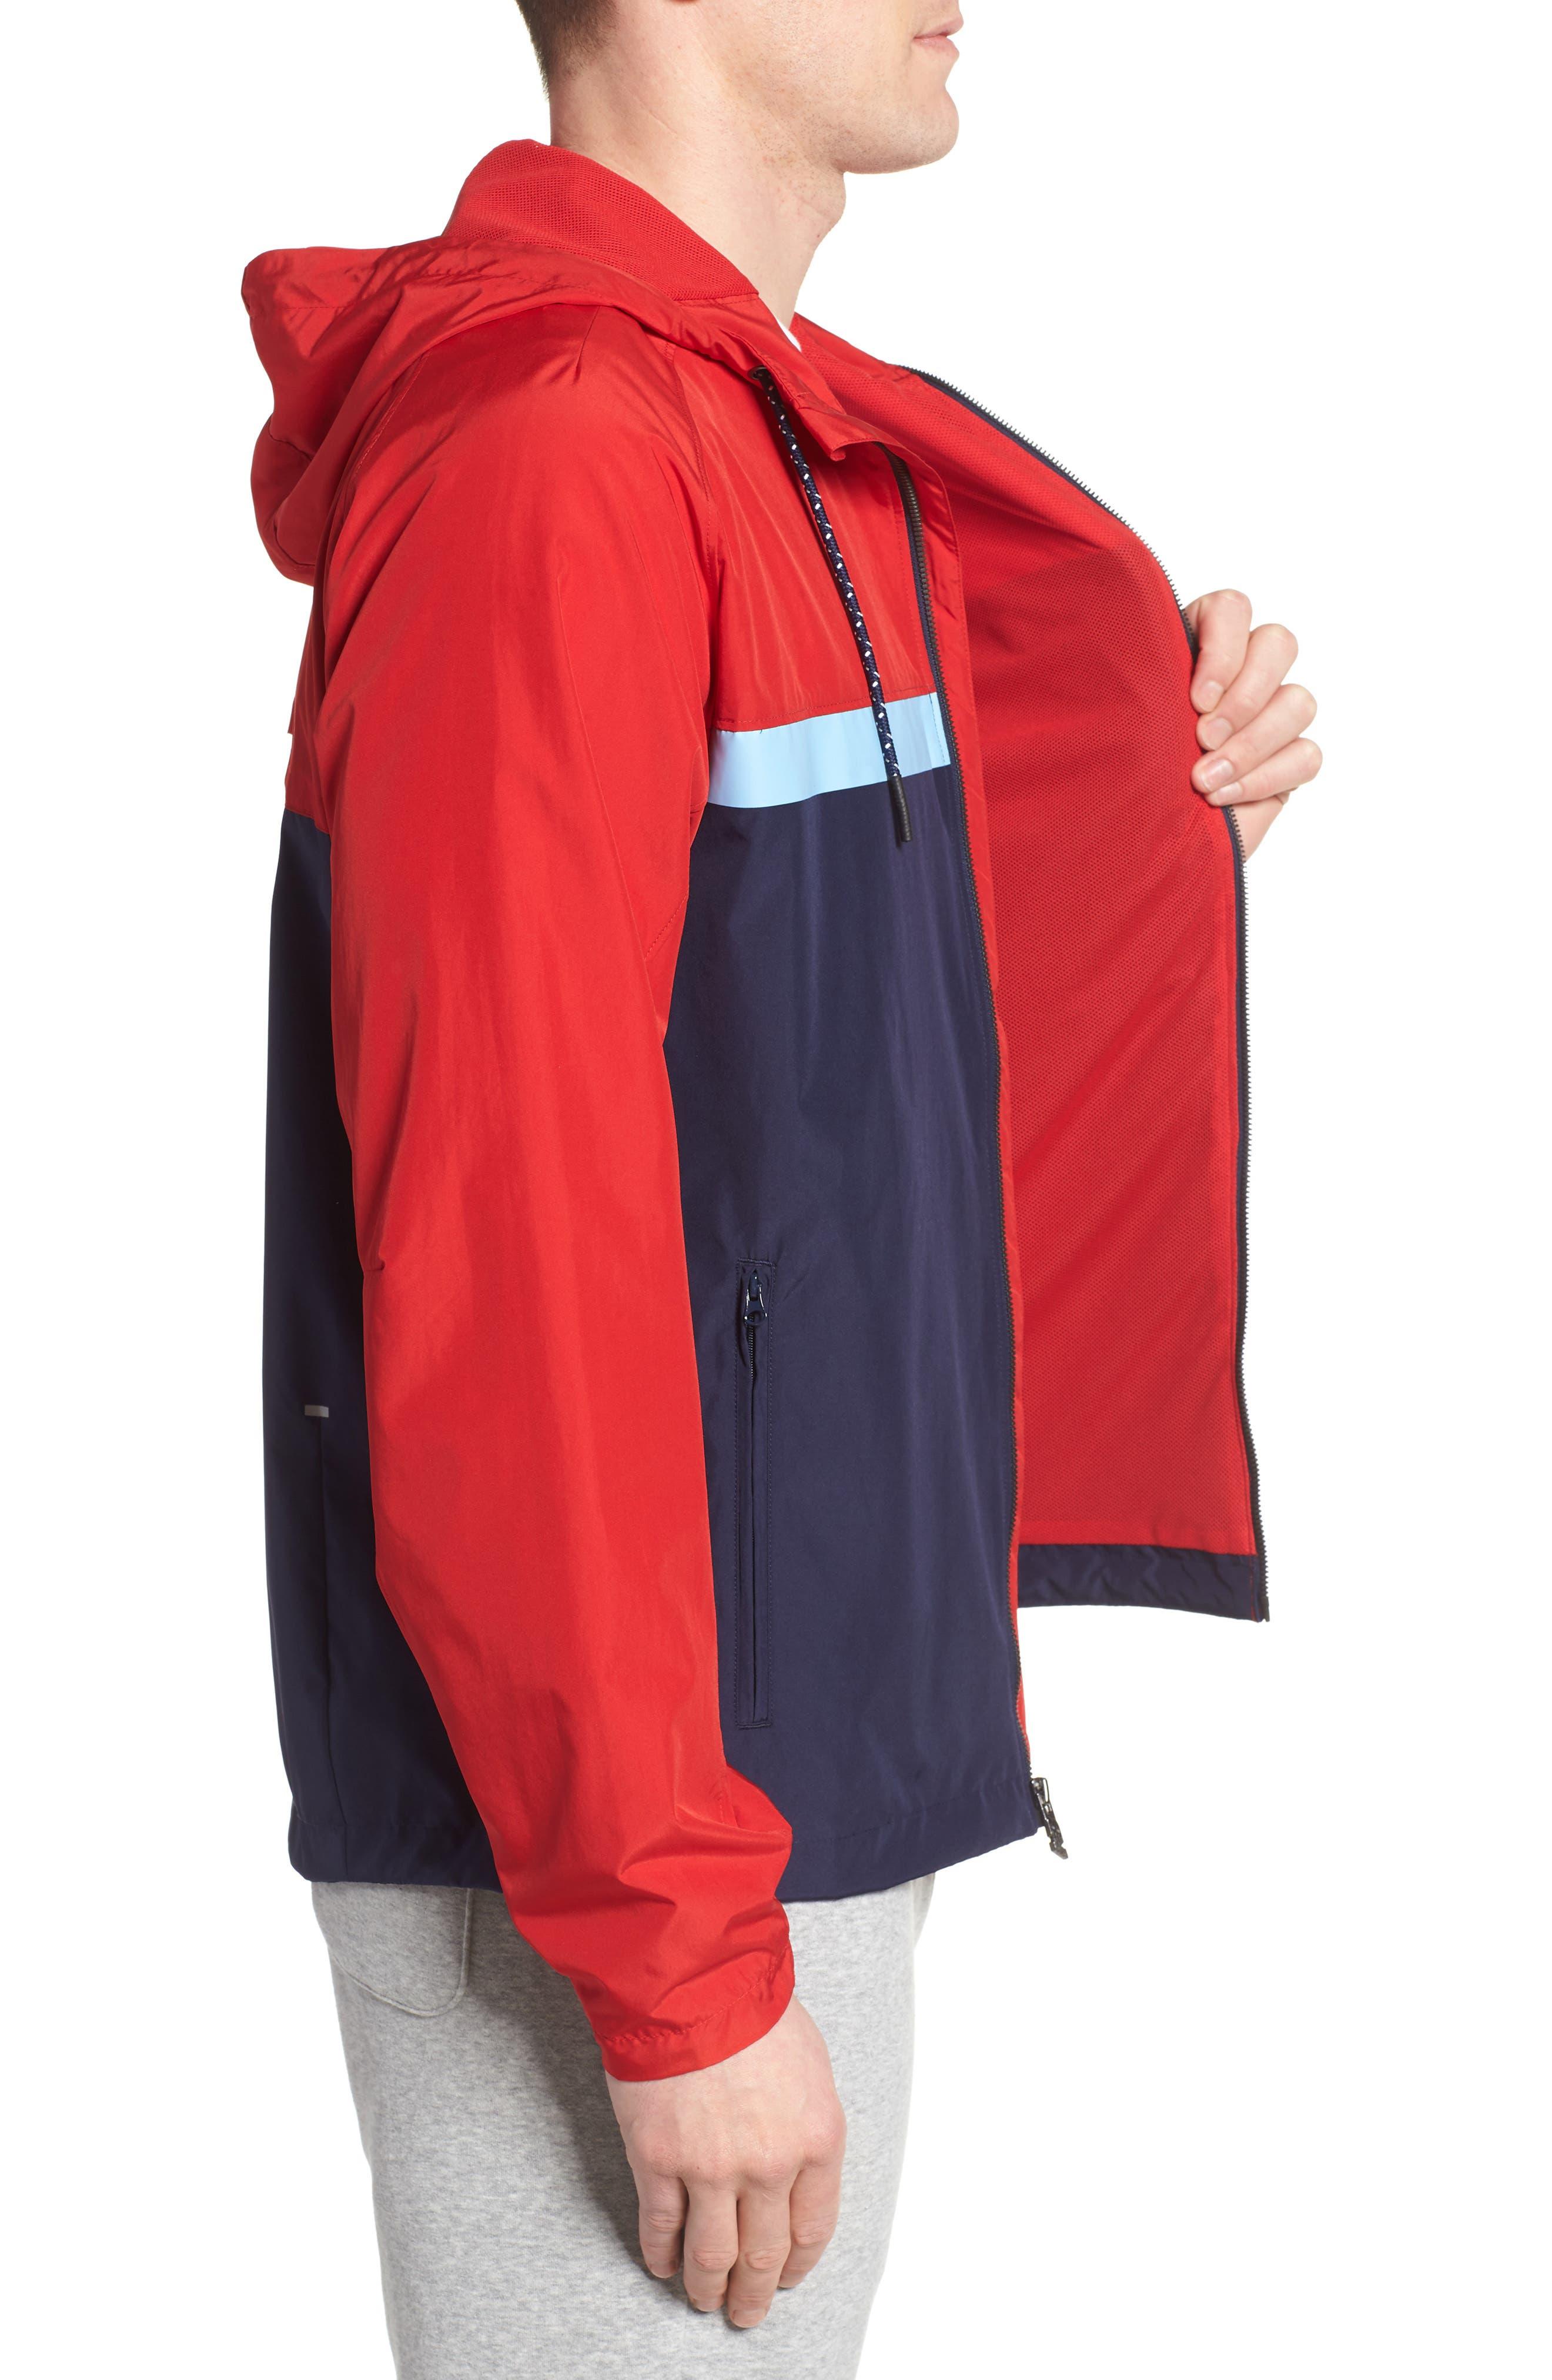 Athletics 78 Jacket,                             Alternate thumbnail 3, color,                             Team Red